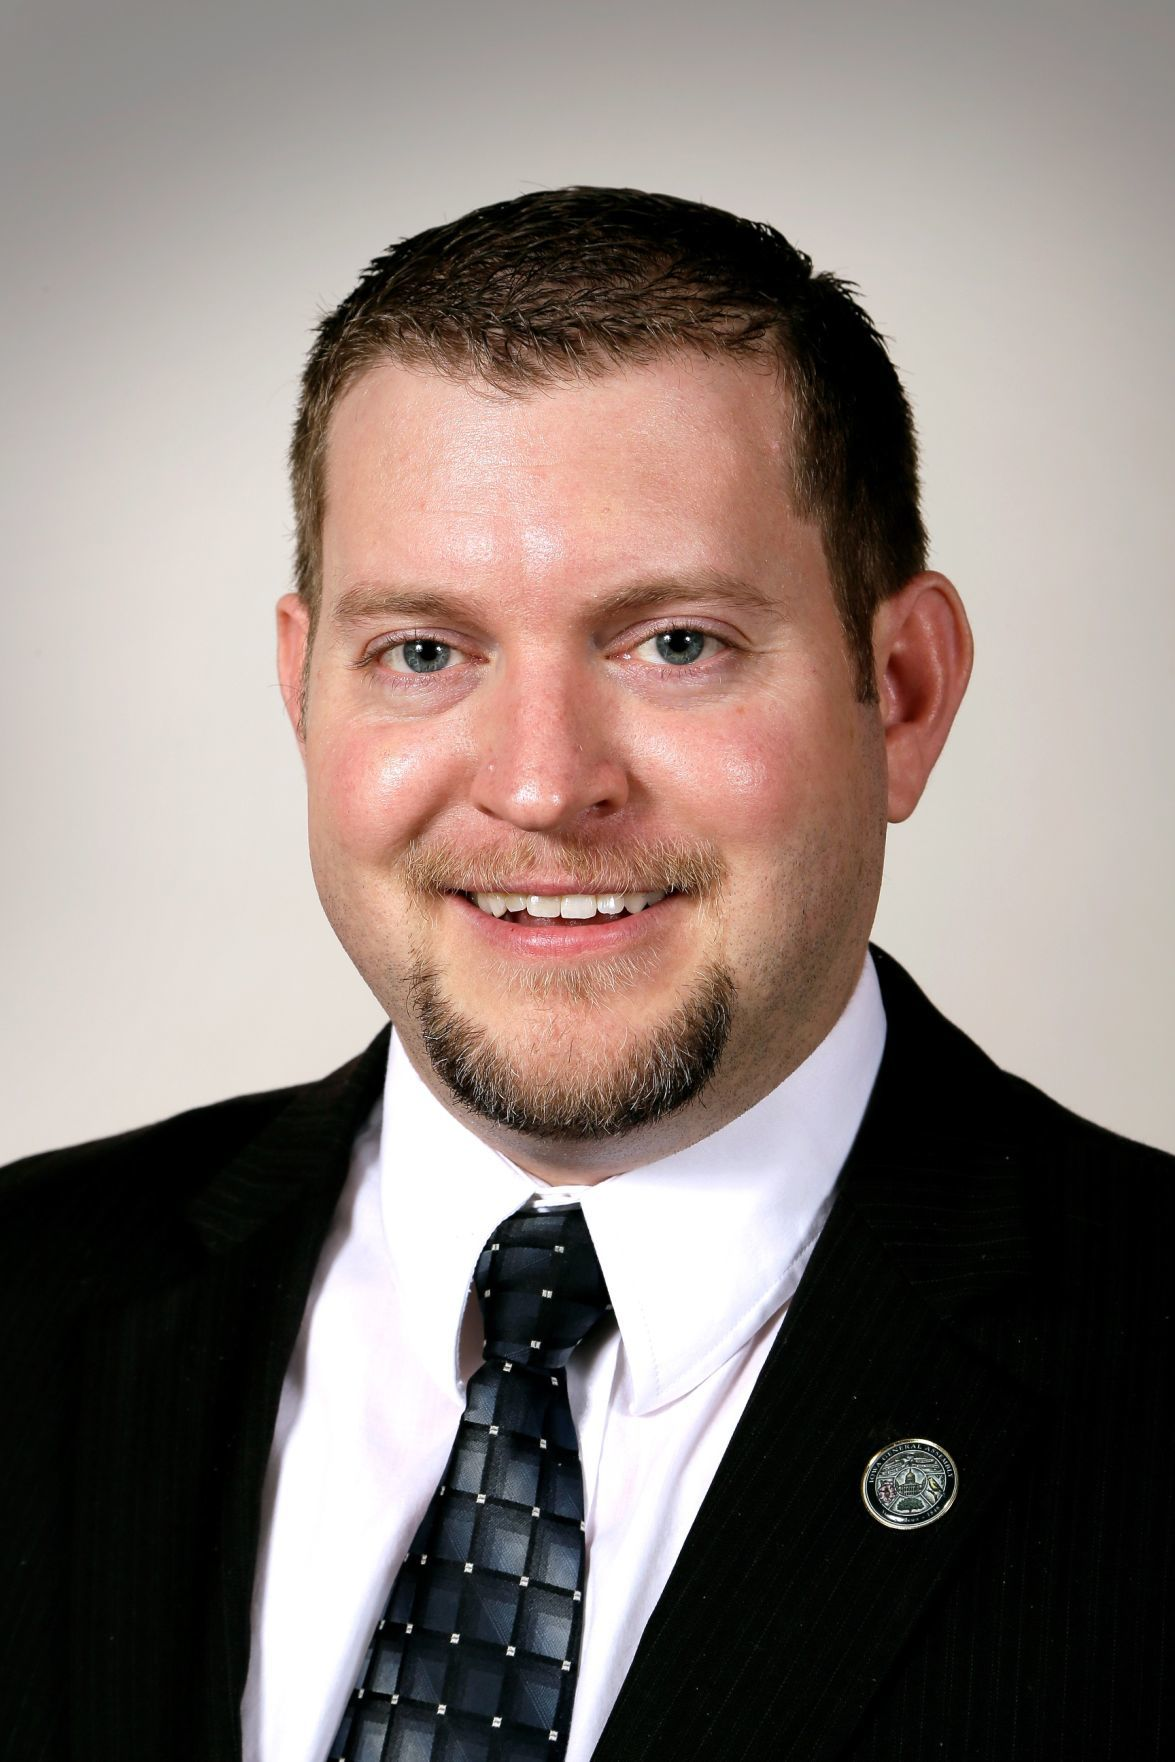 Iowa state Sen. Jake Chapman